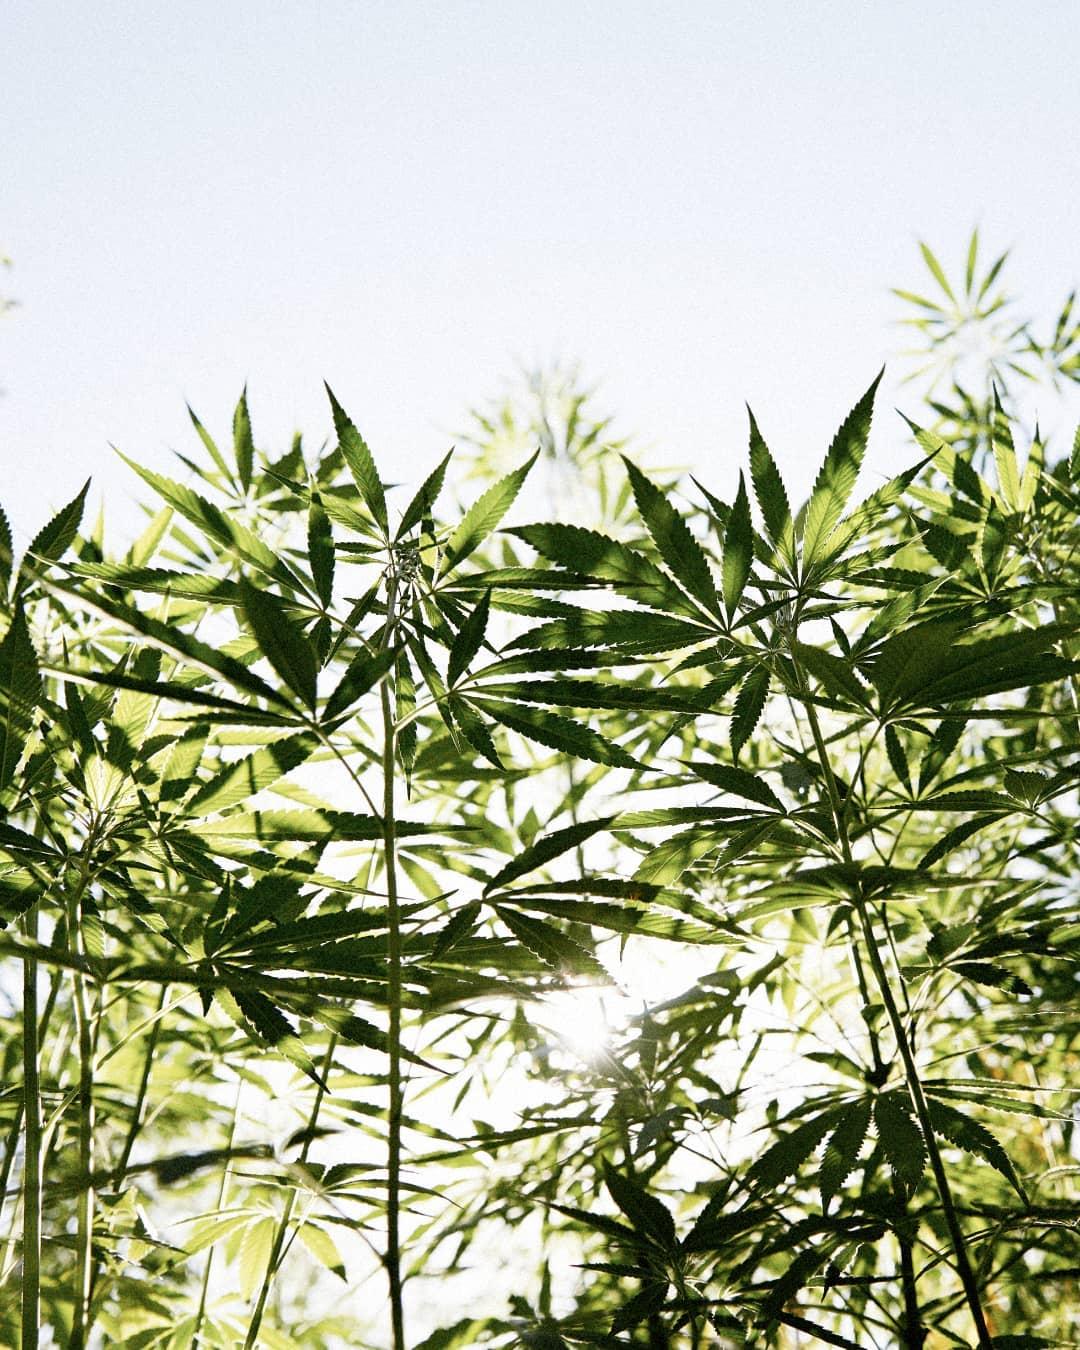 marijuana-strain-hybrid-glass-jars-full